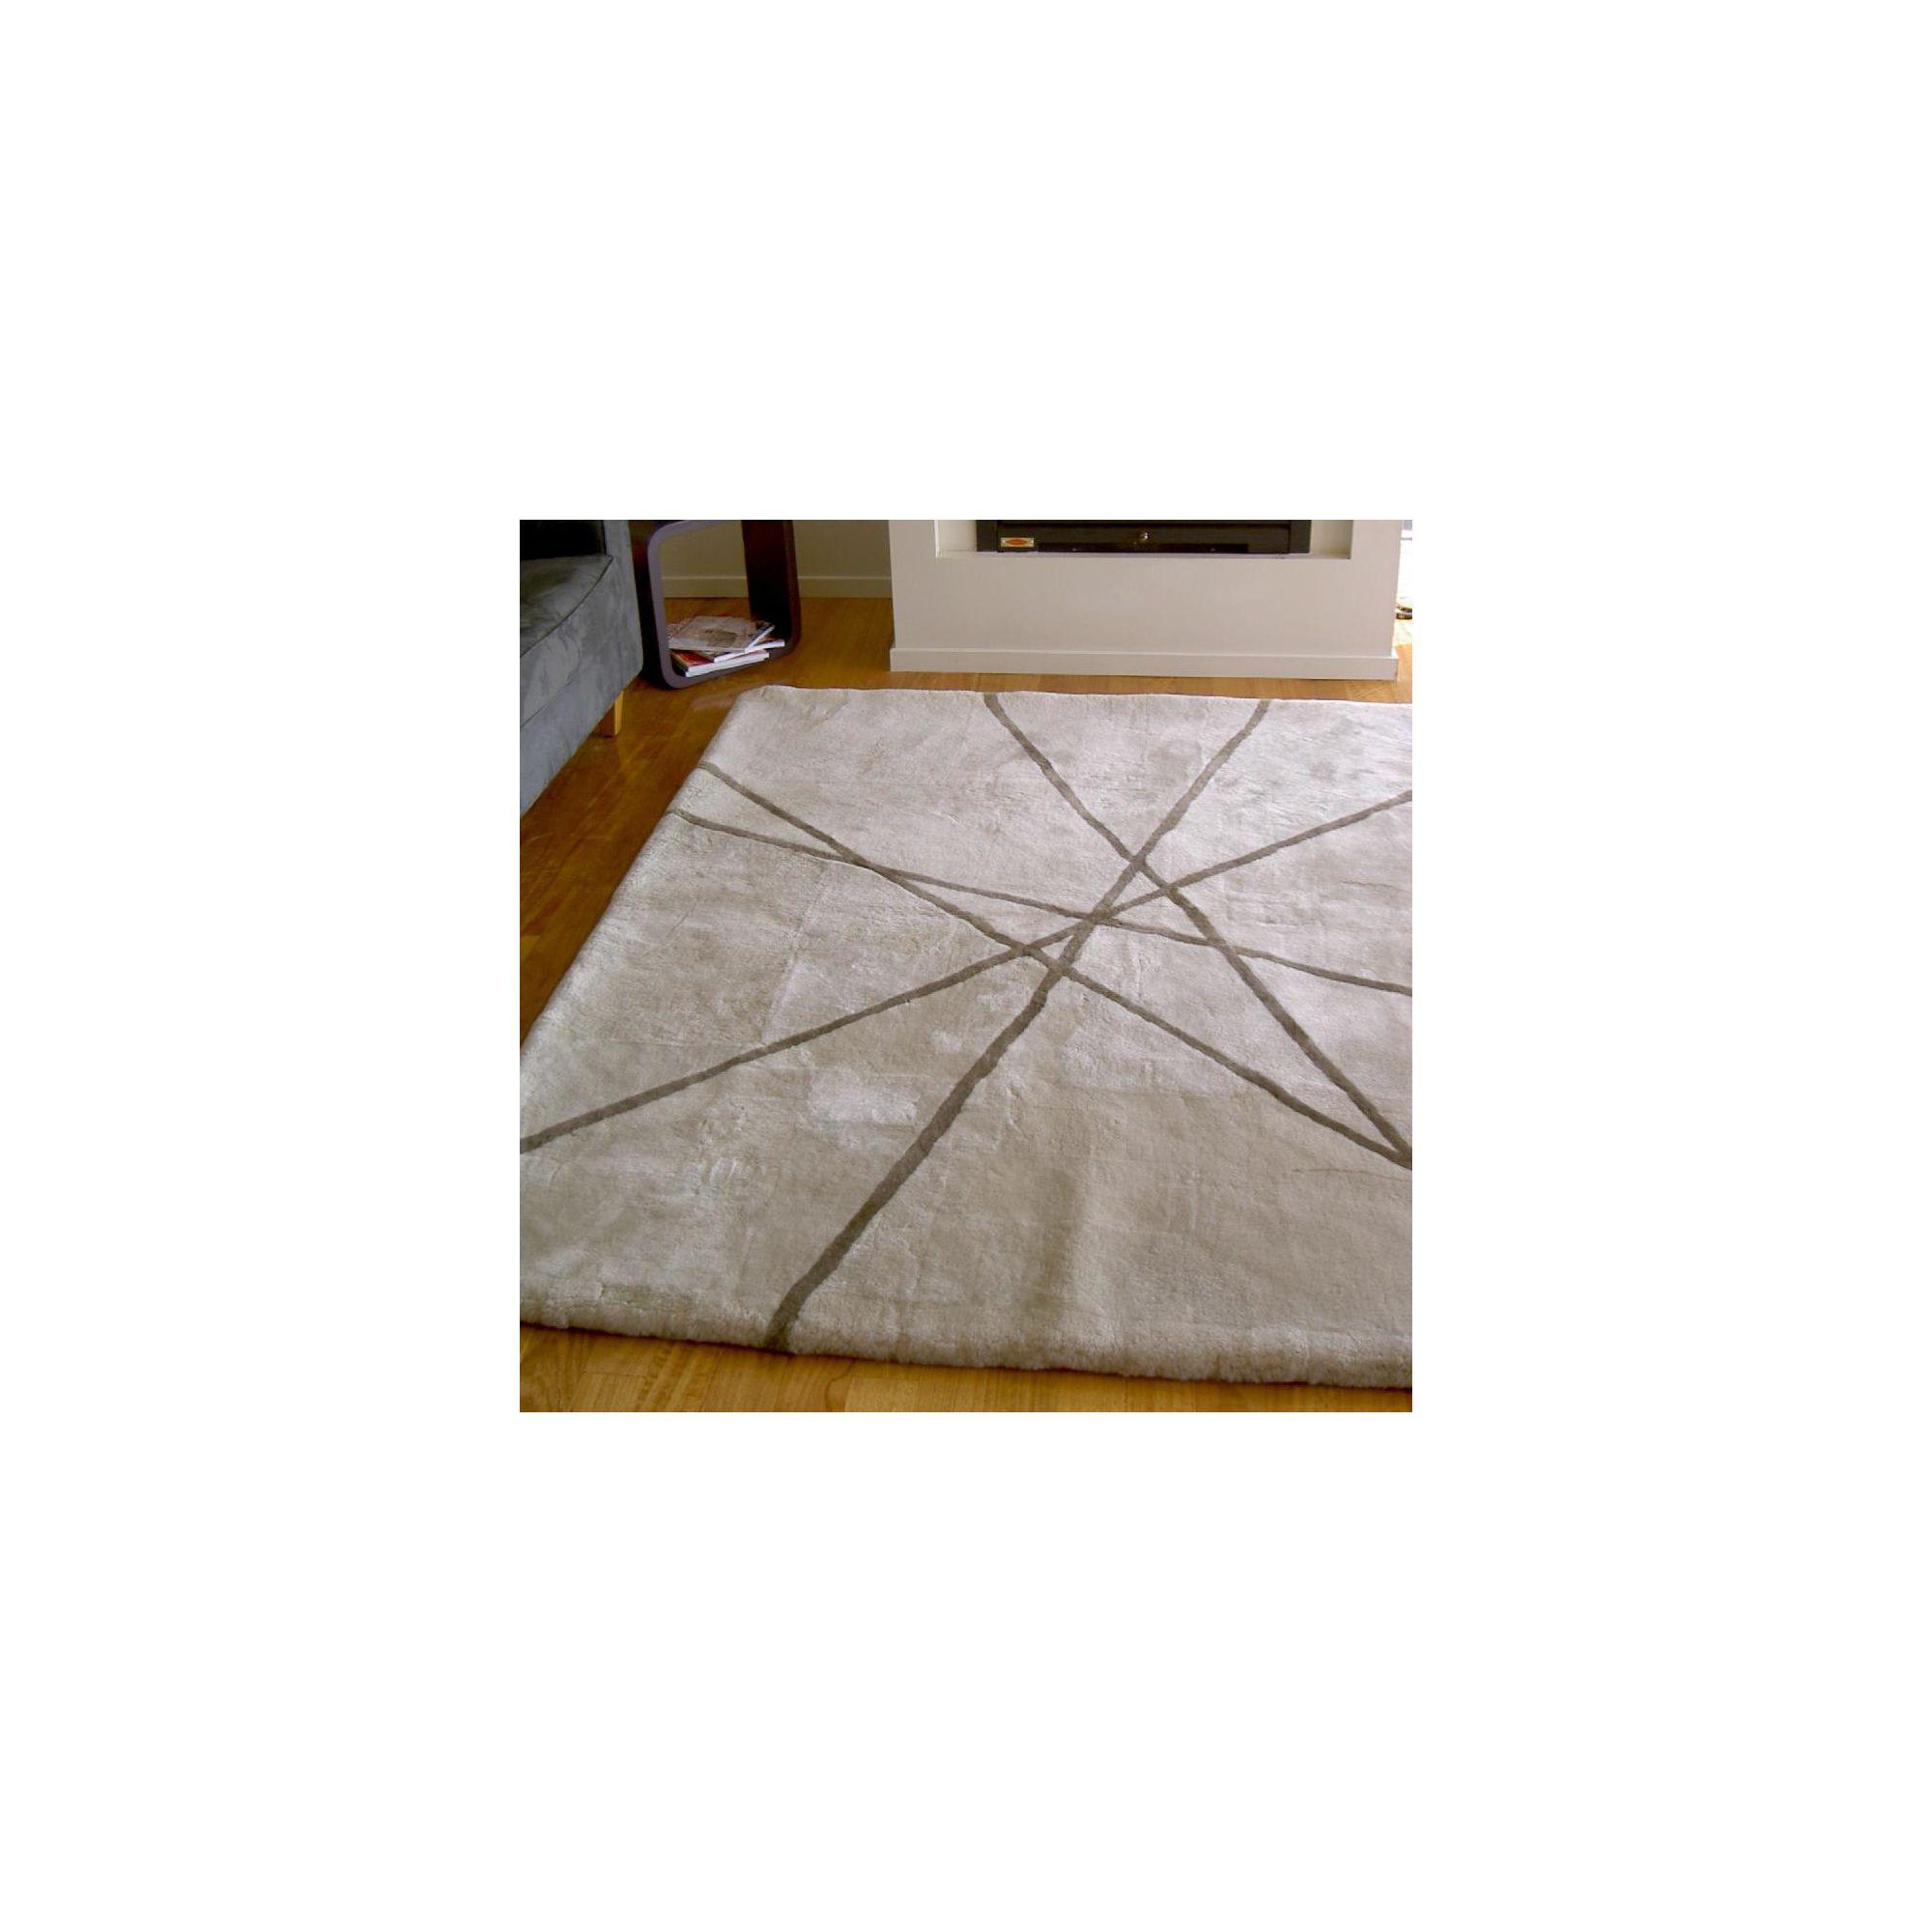 Bowron Sheepskin Shortwool Design Lines Rug - 350cm H x 250cm W x 1cm D at Tesco Direct